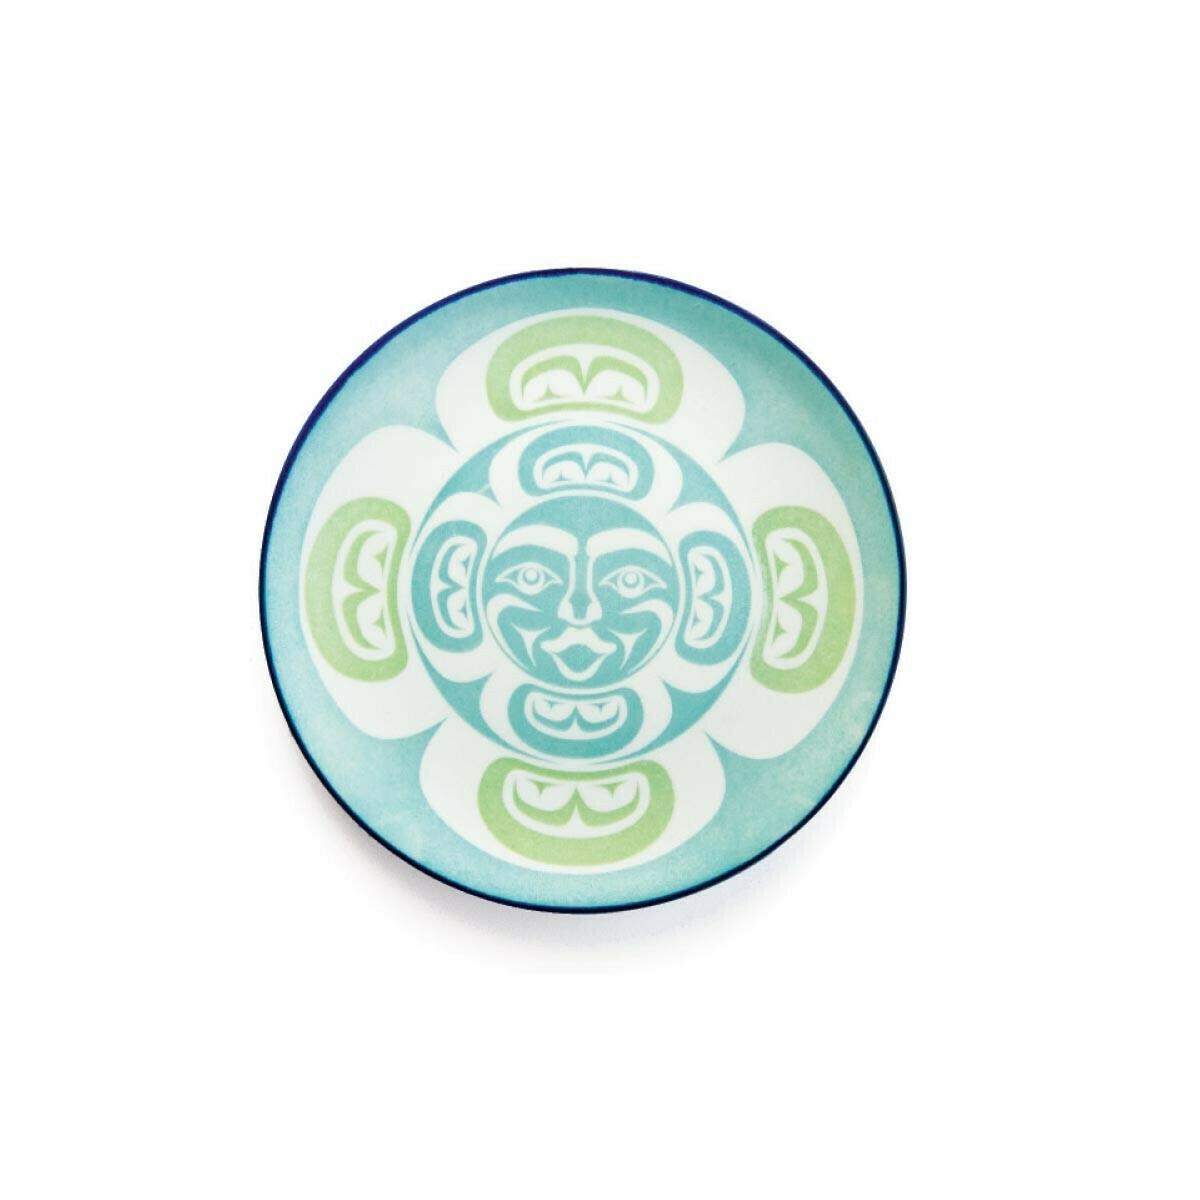 Porcelain Art Plate - Moon